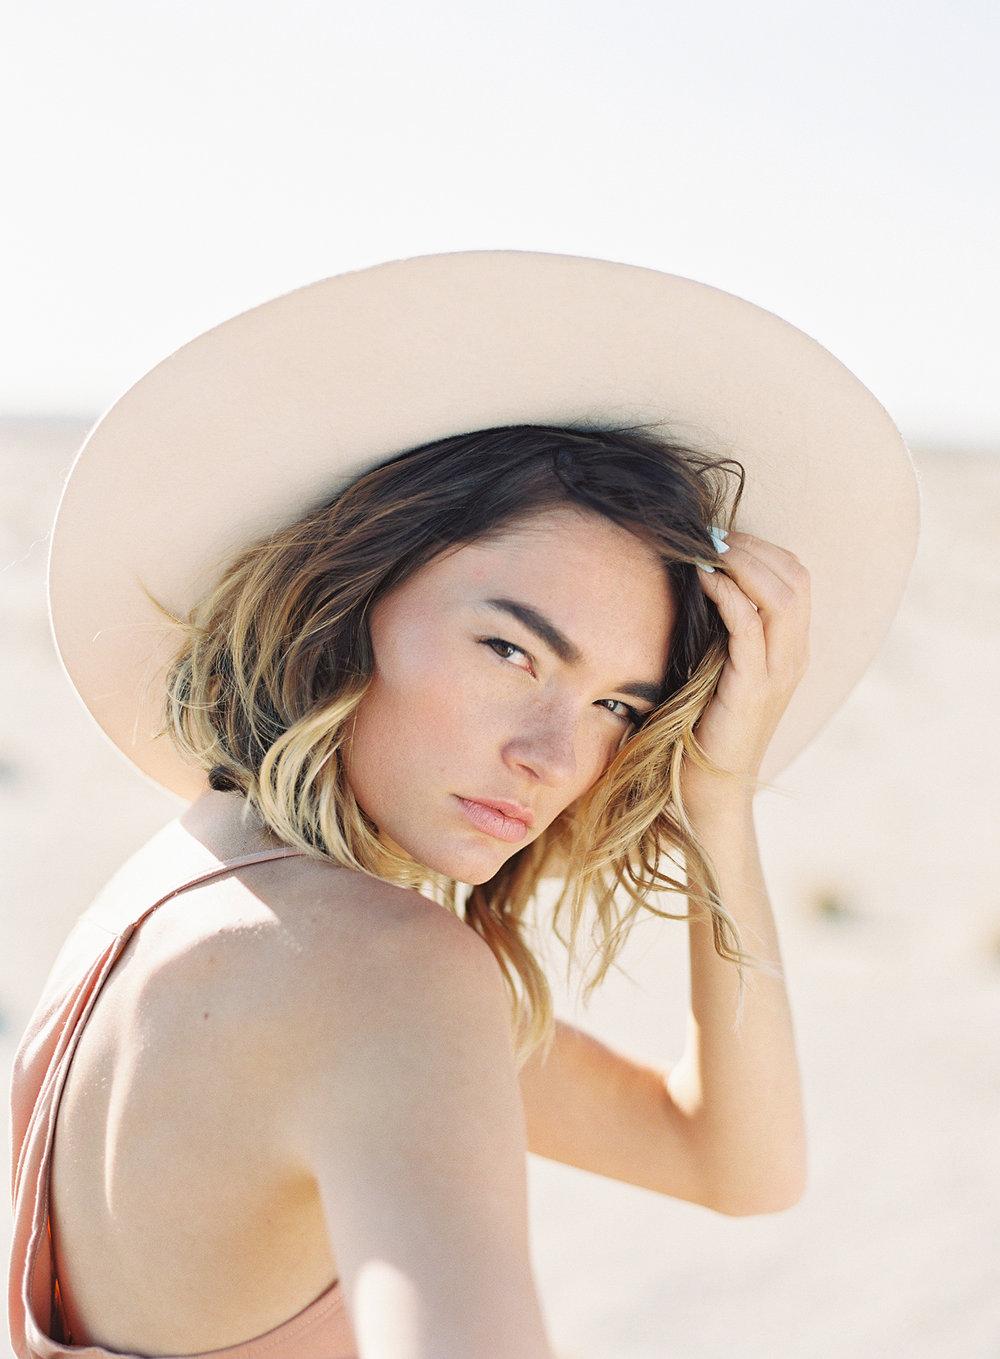 desert-fashion-5.jpg